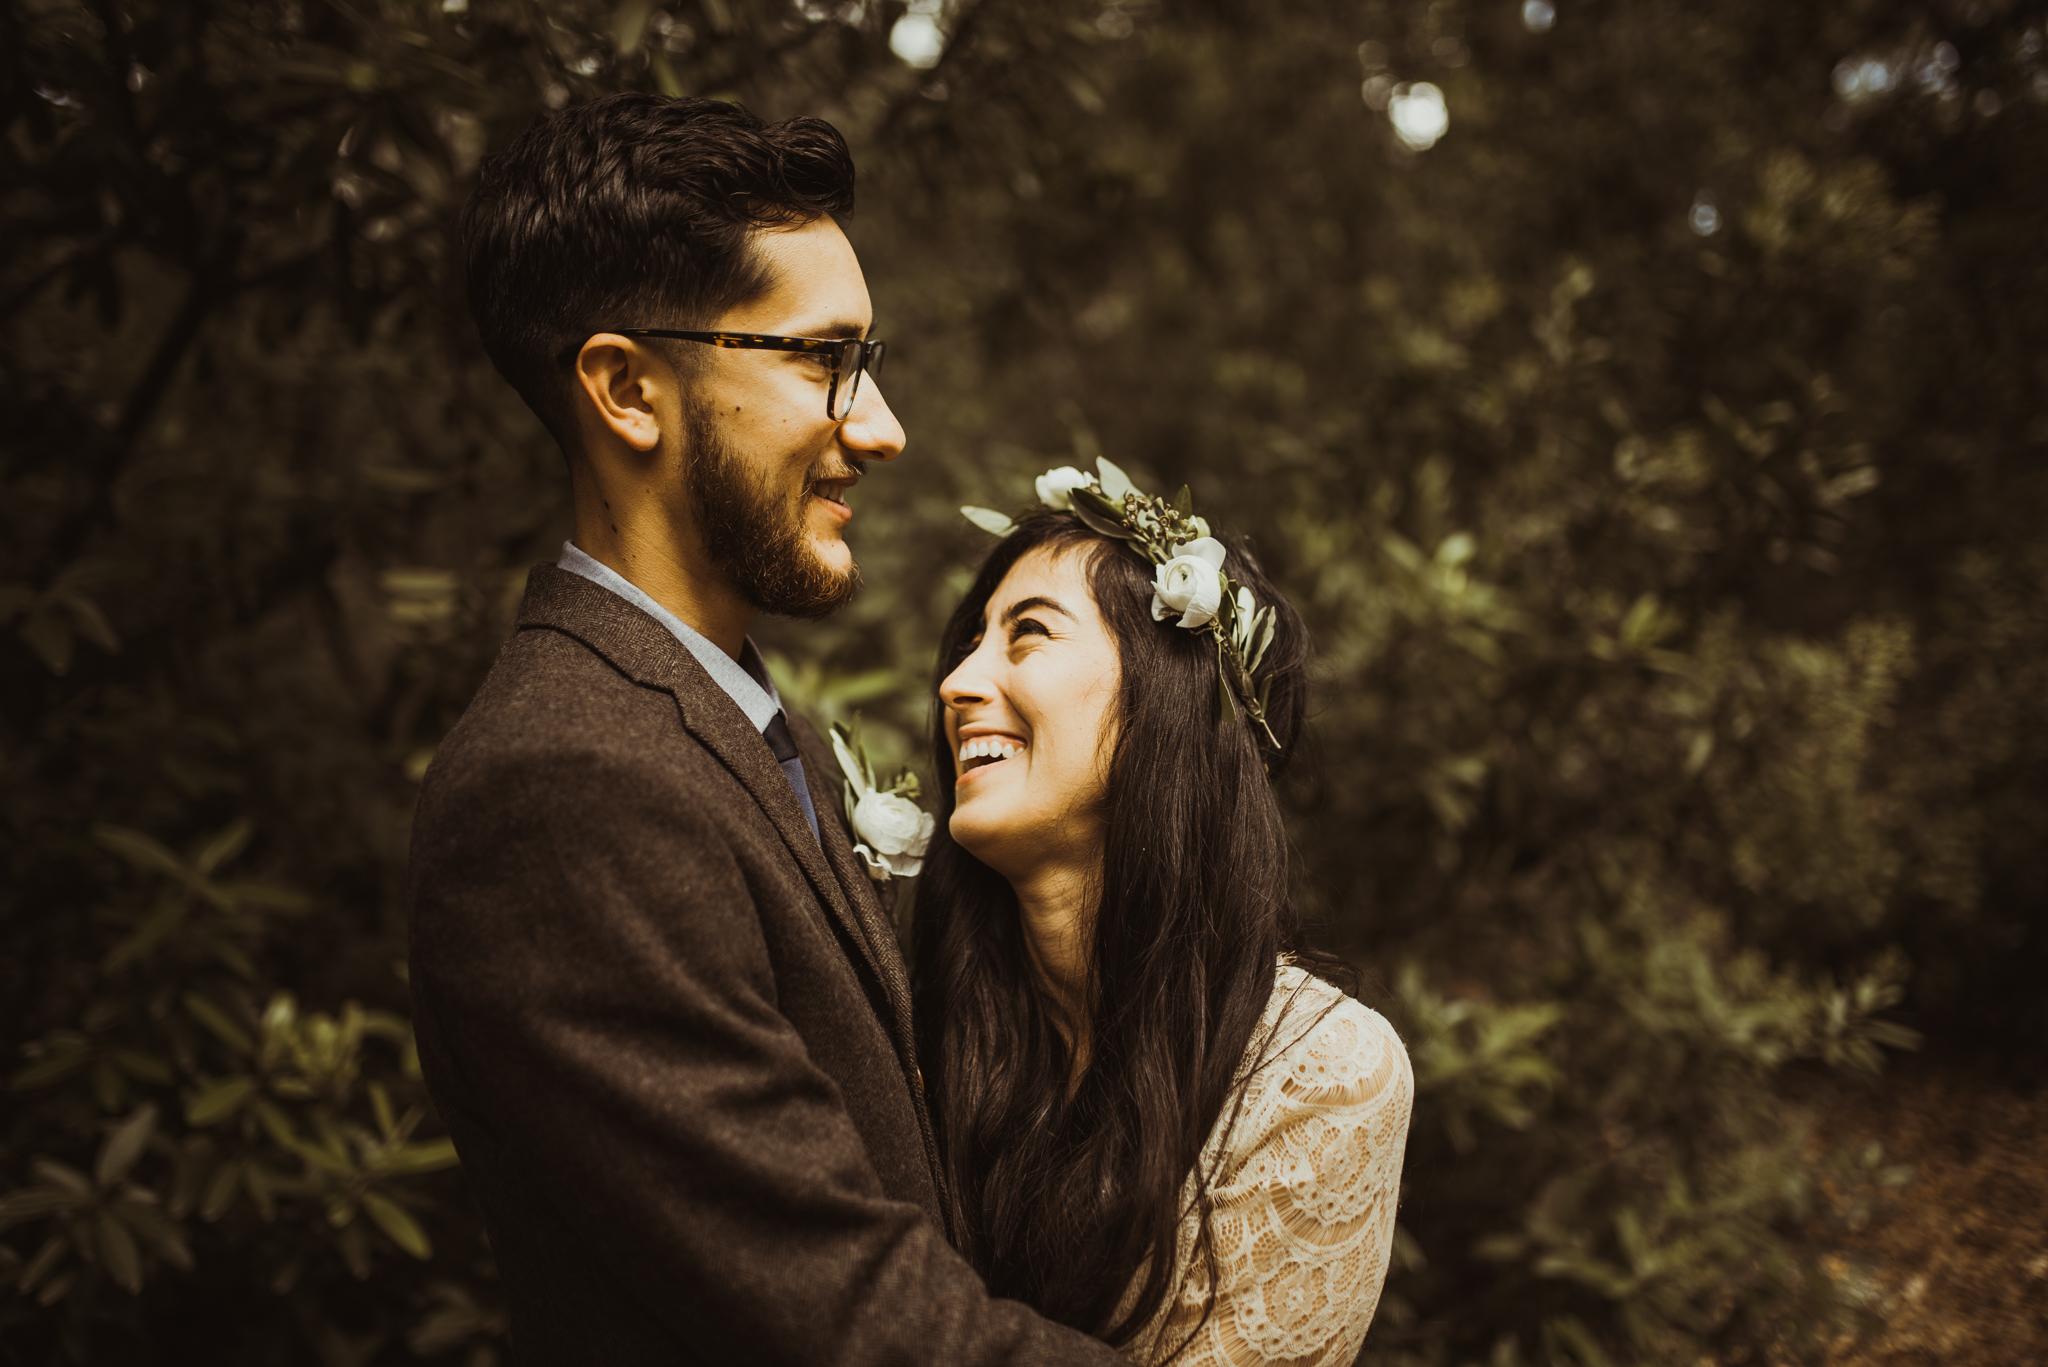 ©Isaiah-&-Taylor-Photography---Oak-Canyon-Nature-Center-Wedding,-Anaheim-Hills-033.jpg